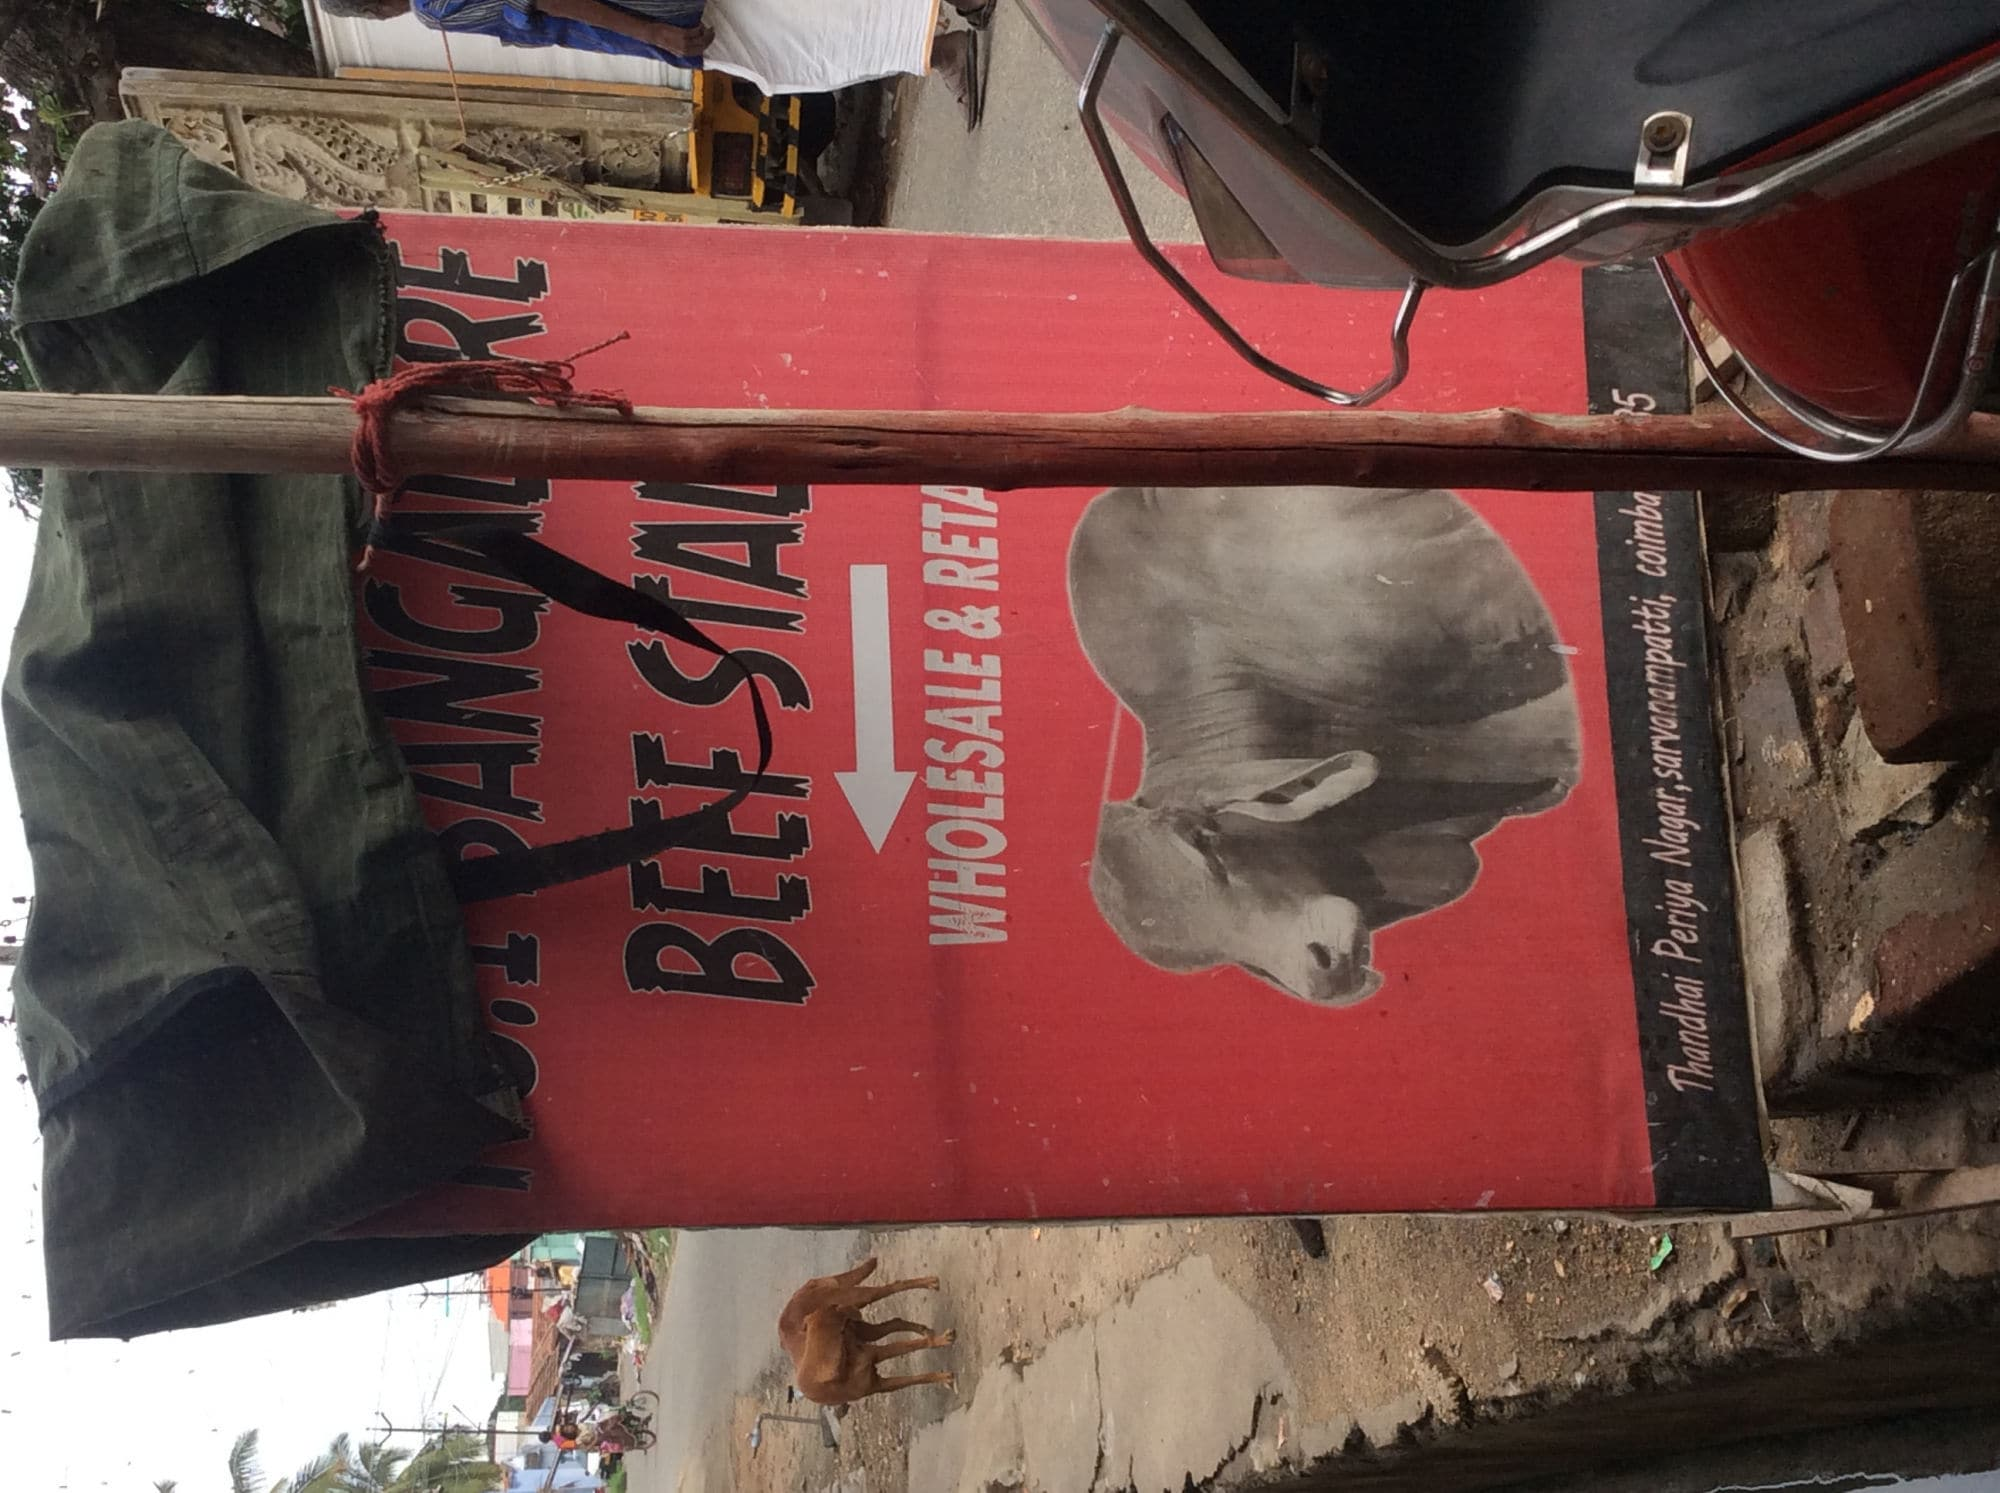 Top Beef Wholesalers in Saravanampatti, Coimbatore - Justdial